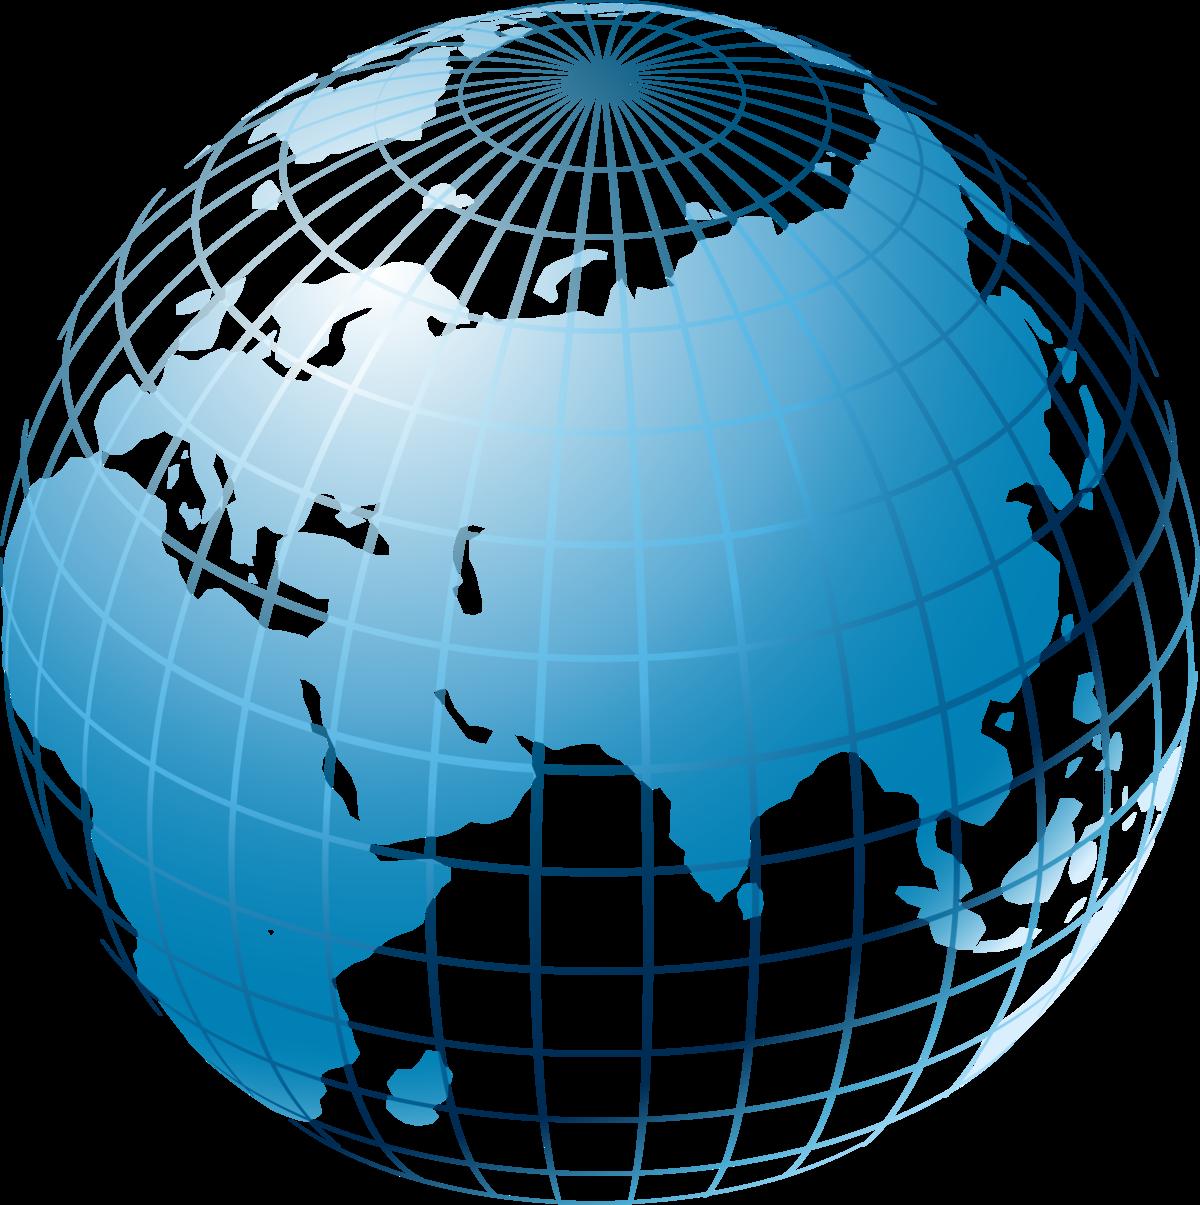 планета логотип картинки